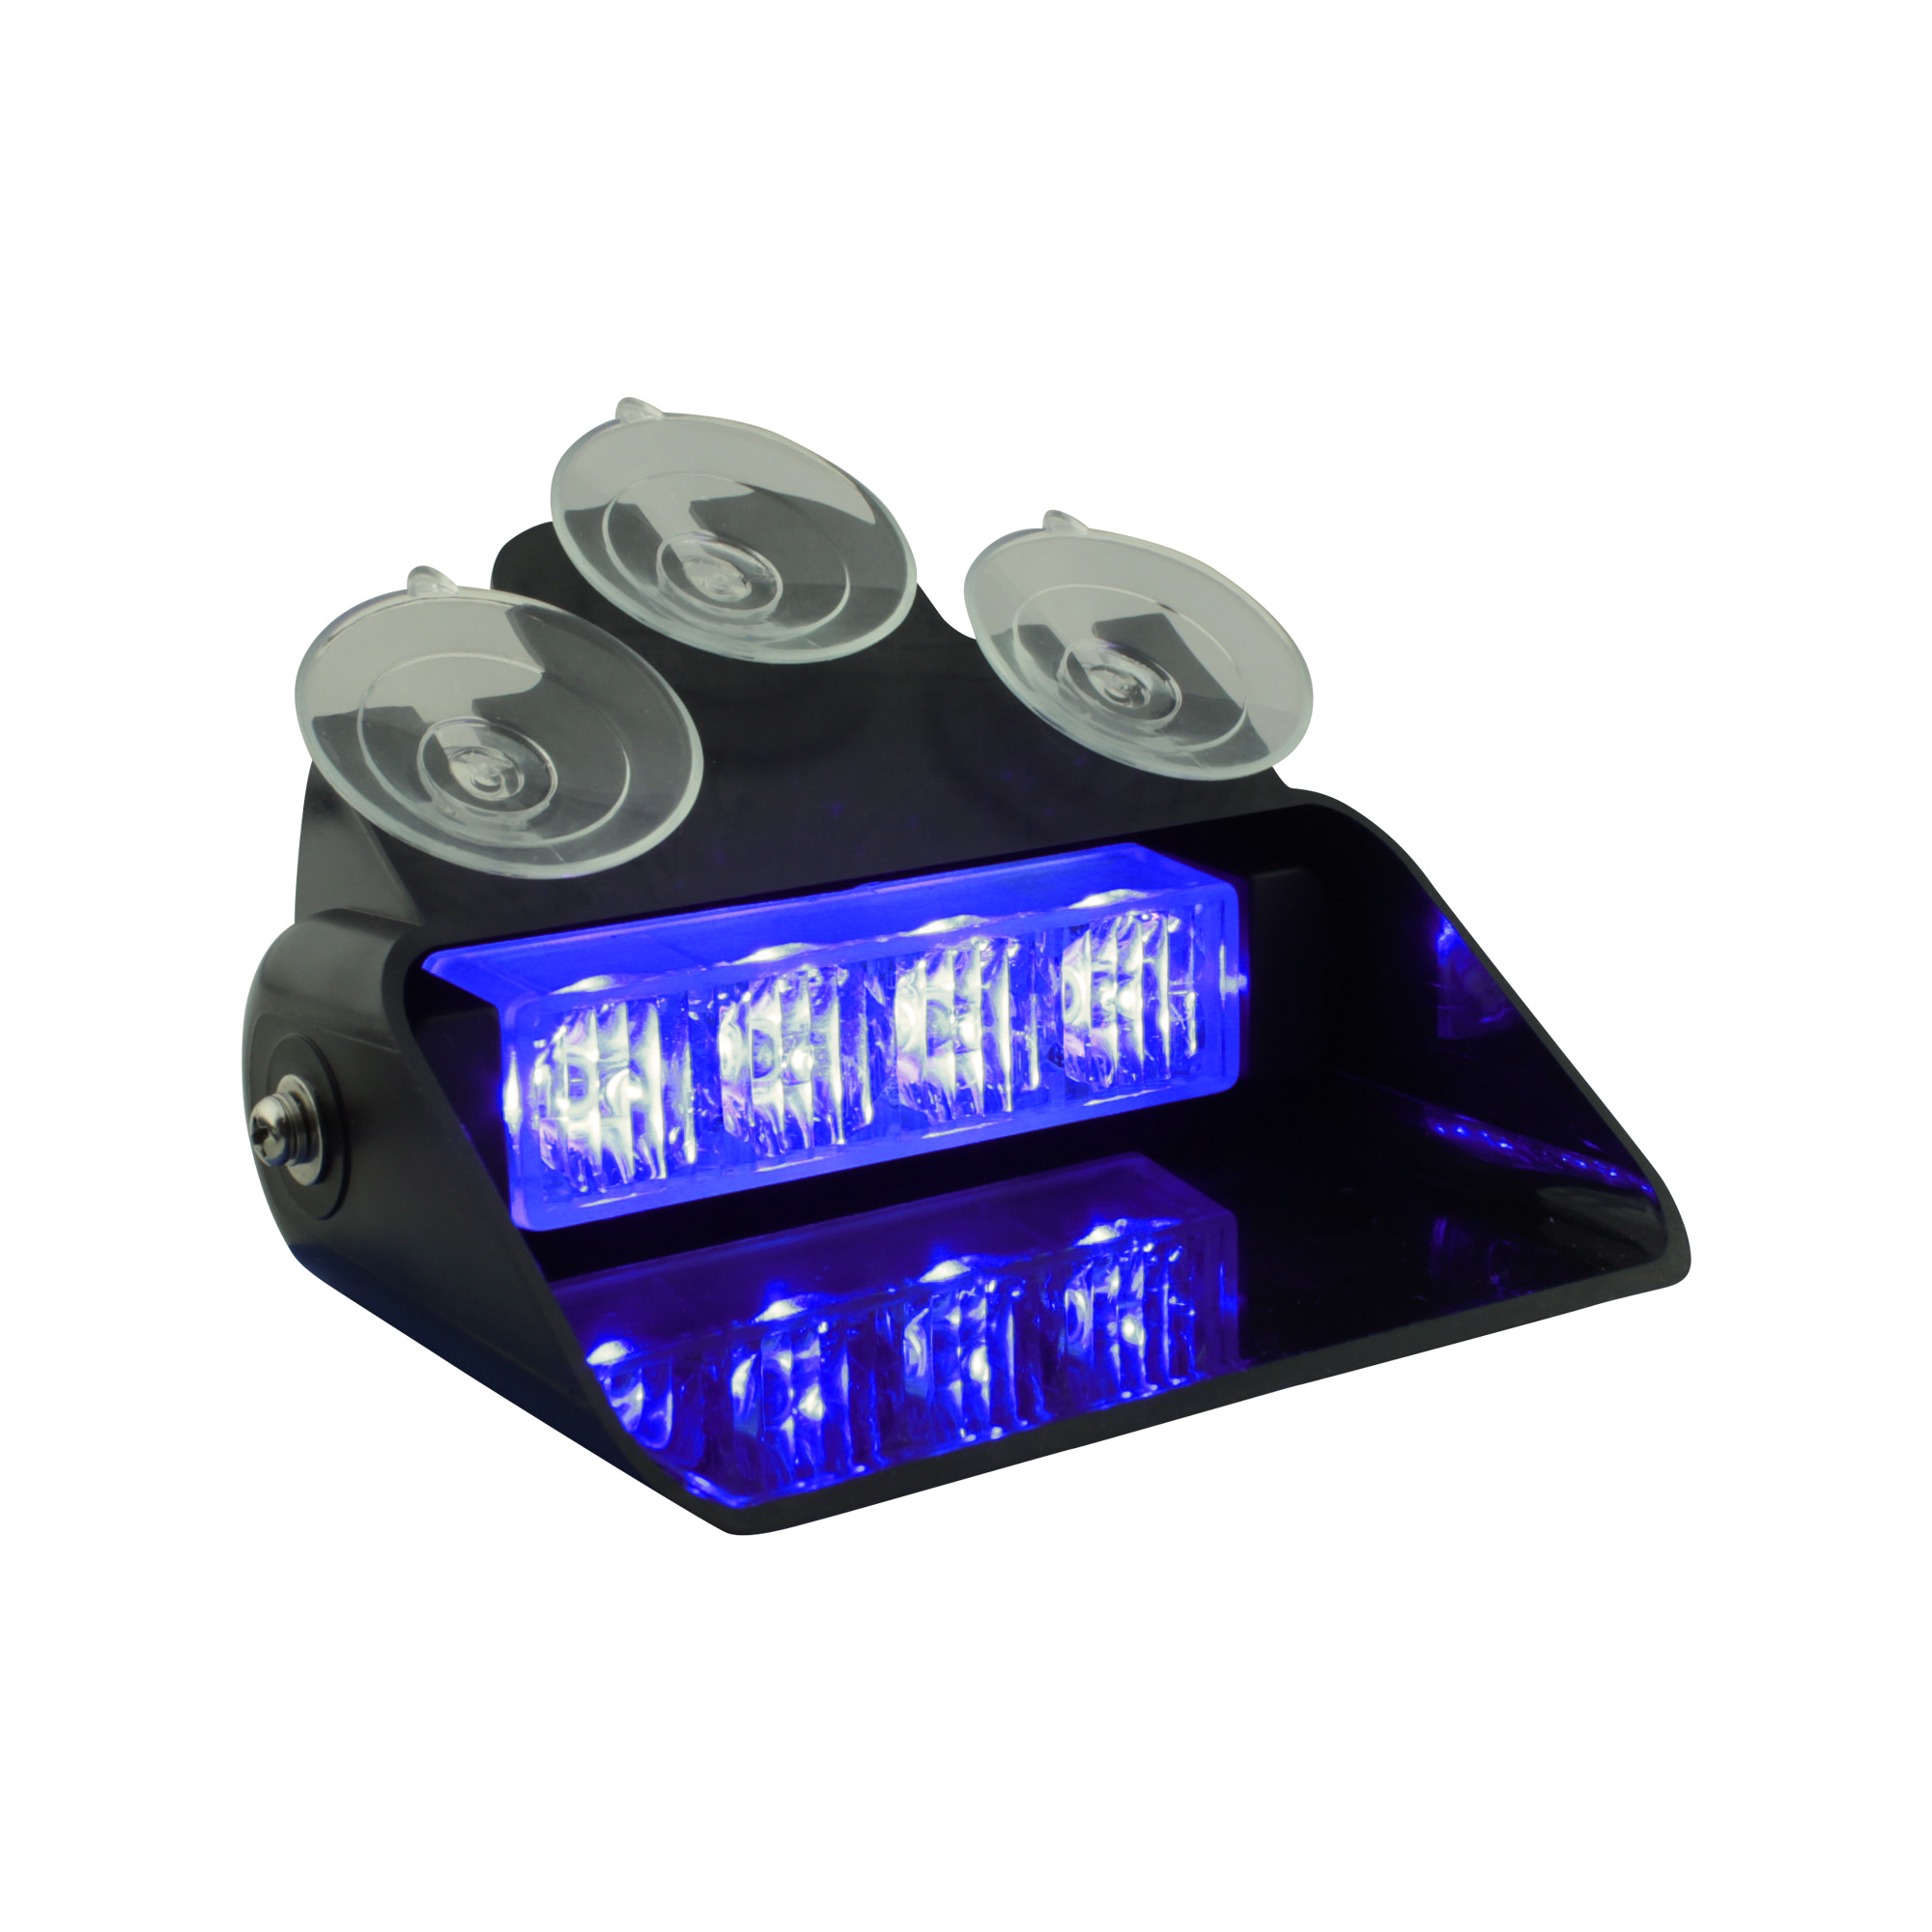 LAMPHUS SolarBlast SBWL14 4W LED Windshield Dash Light - Amber / Blue